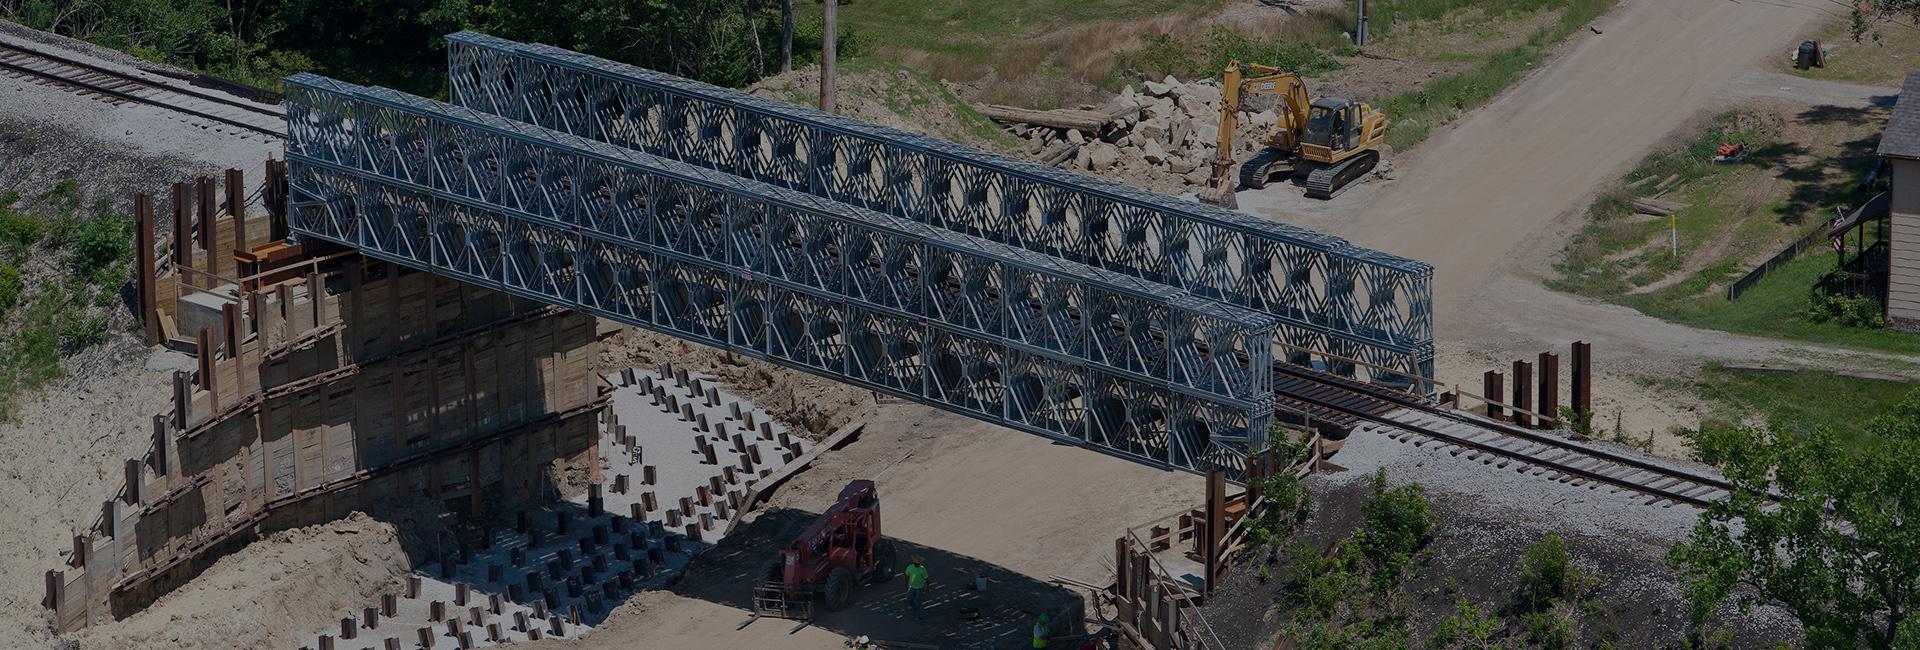 Railroad Prefabricated Modular Bridge